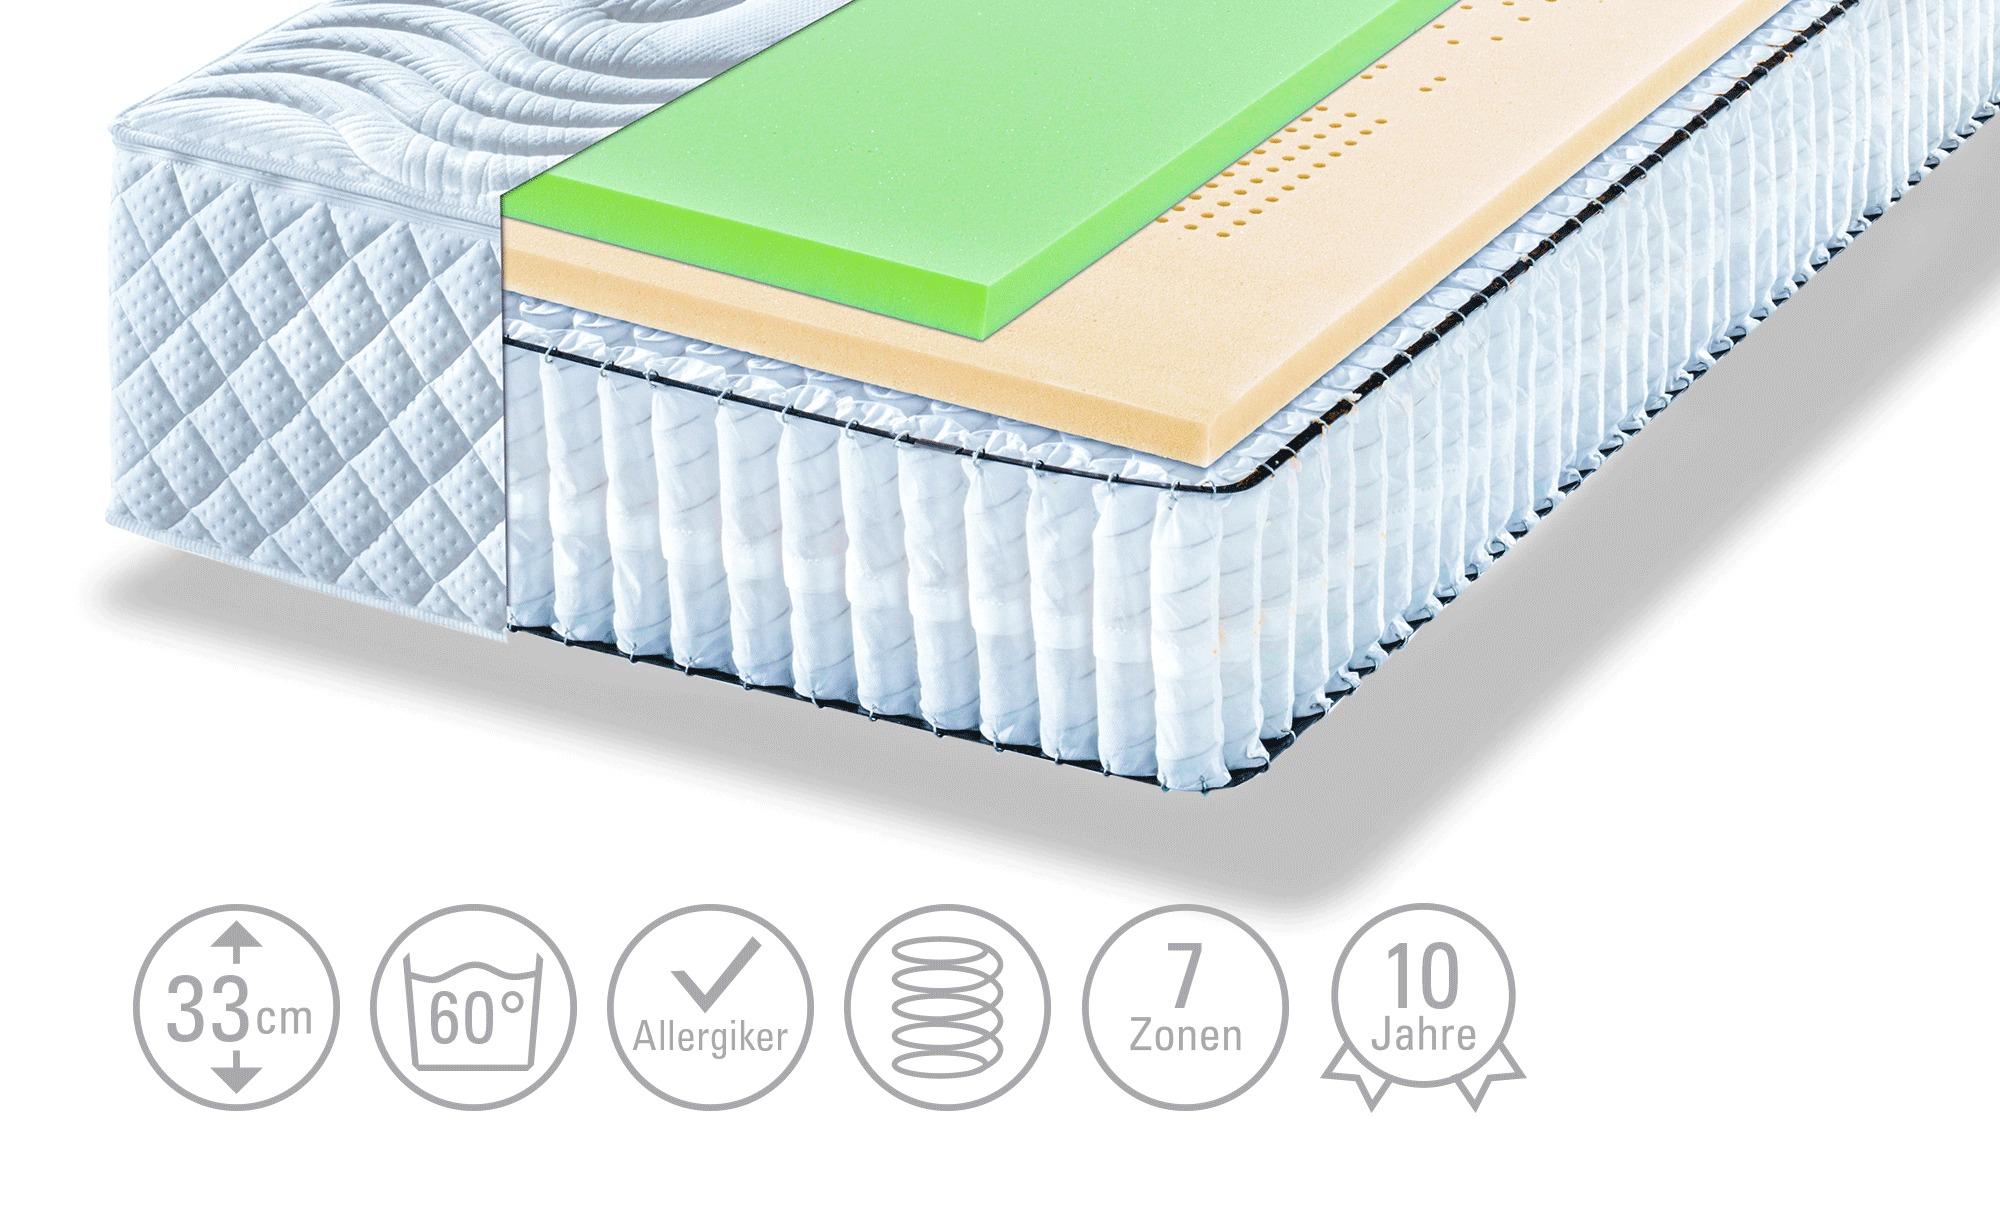 artone tonnentaschenfederkern matratze boxspring comfort products in 2019 matratze